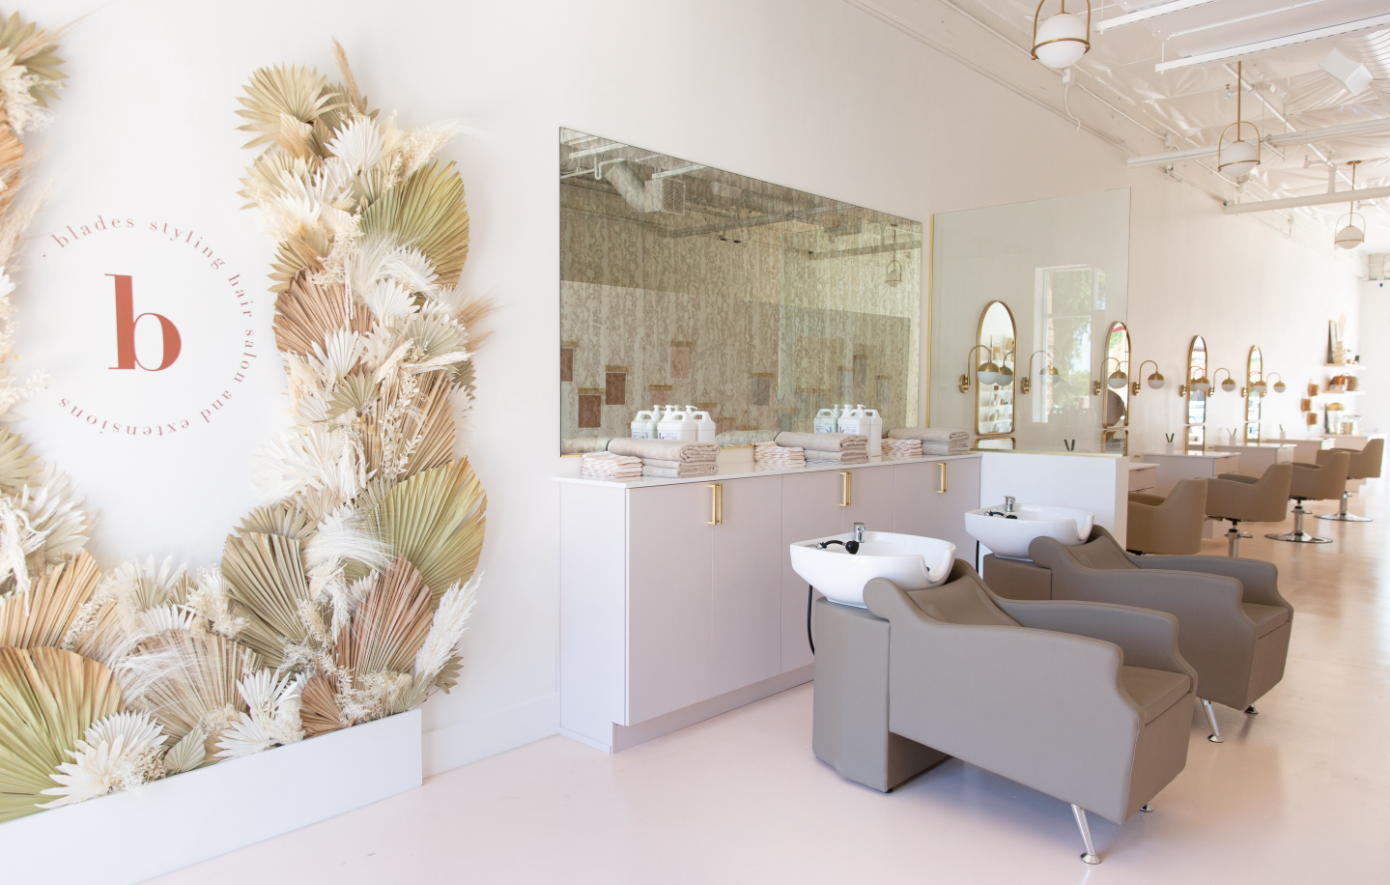 The LifestyleCo #Blades Salon Interior